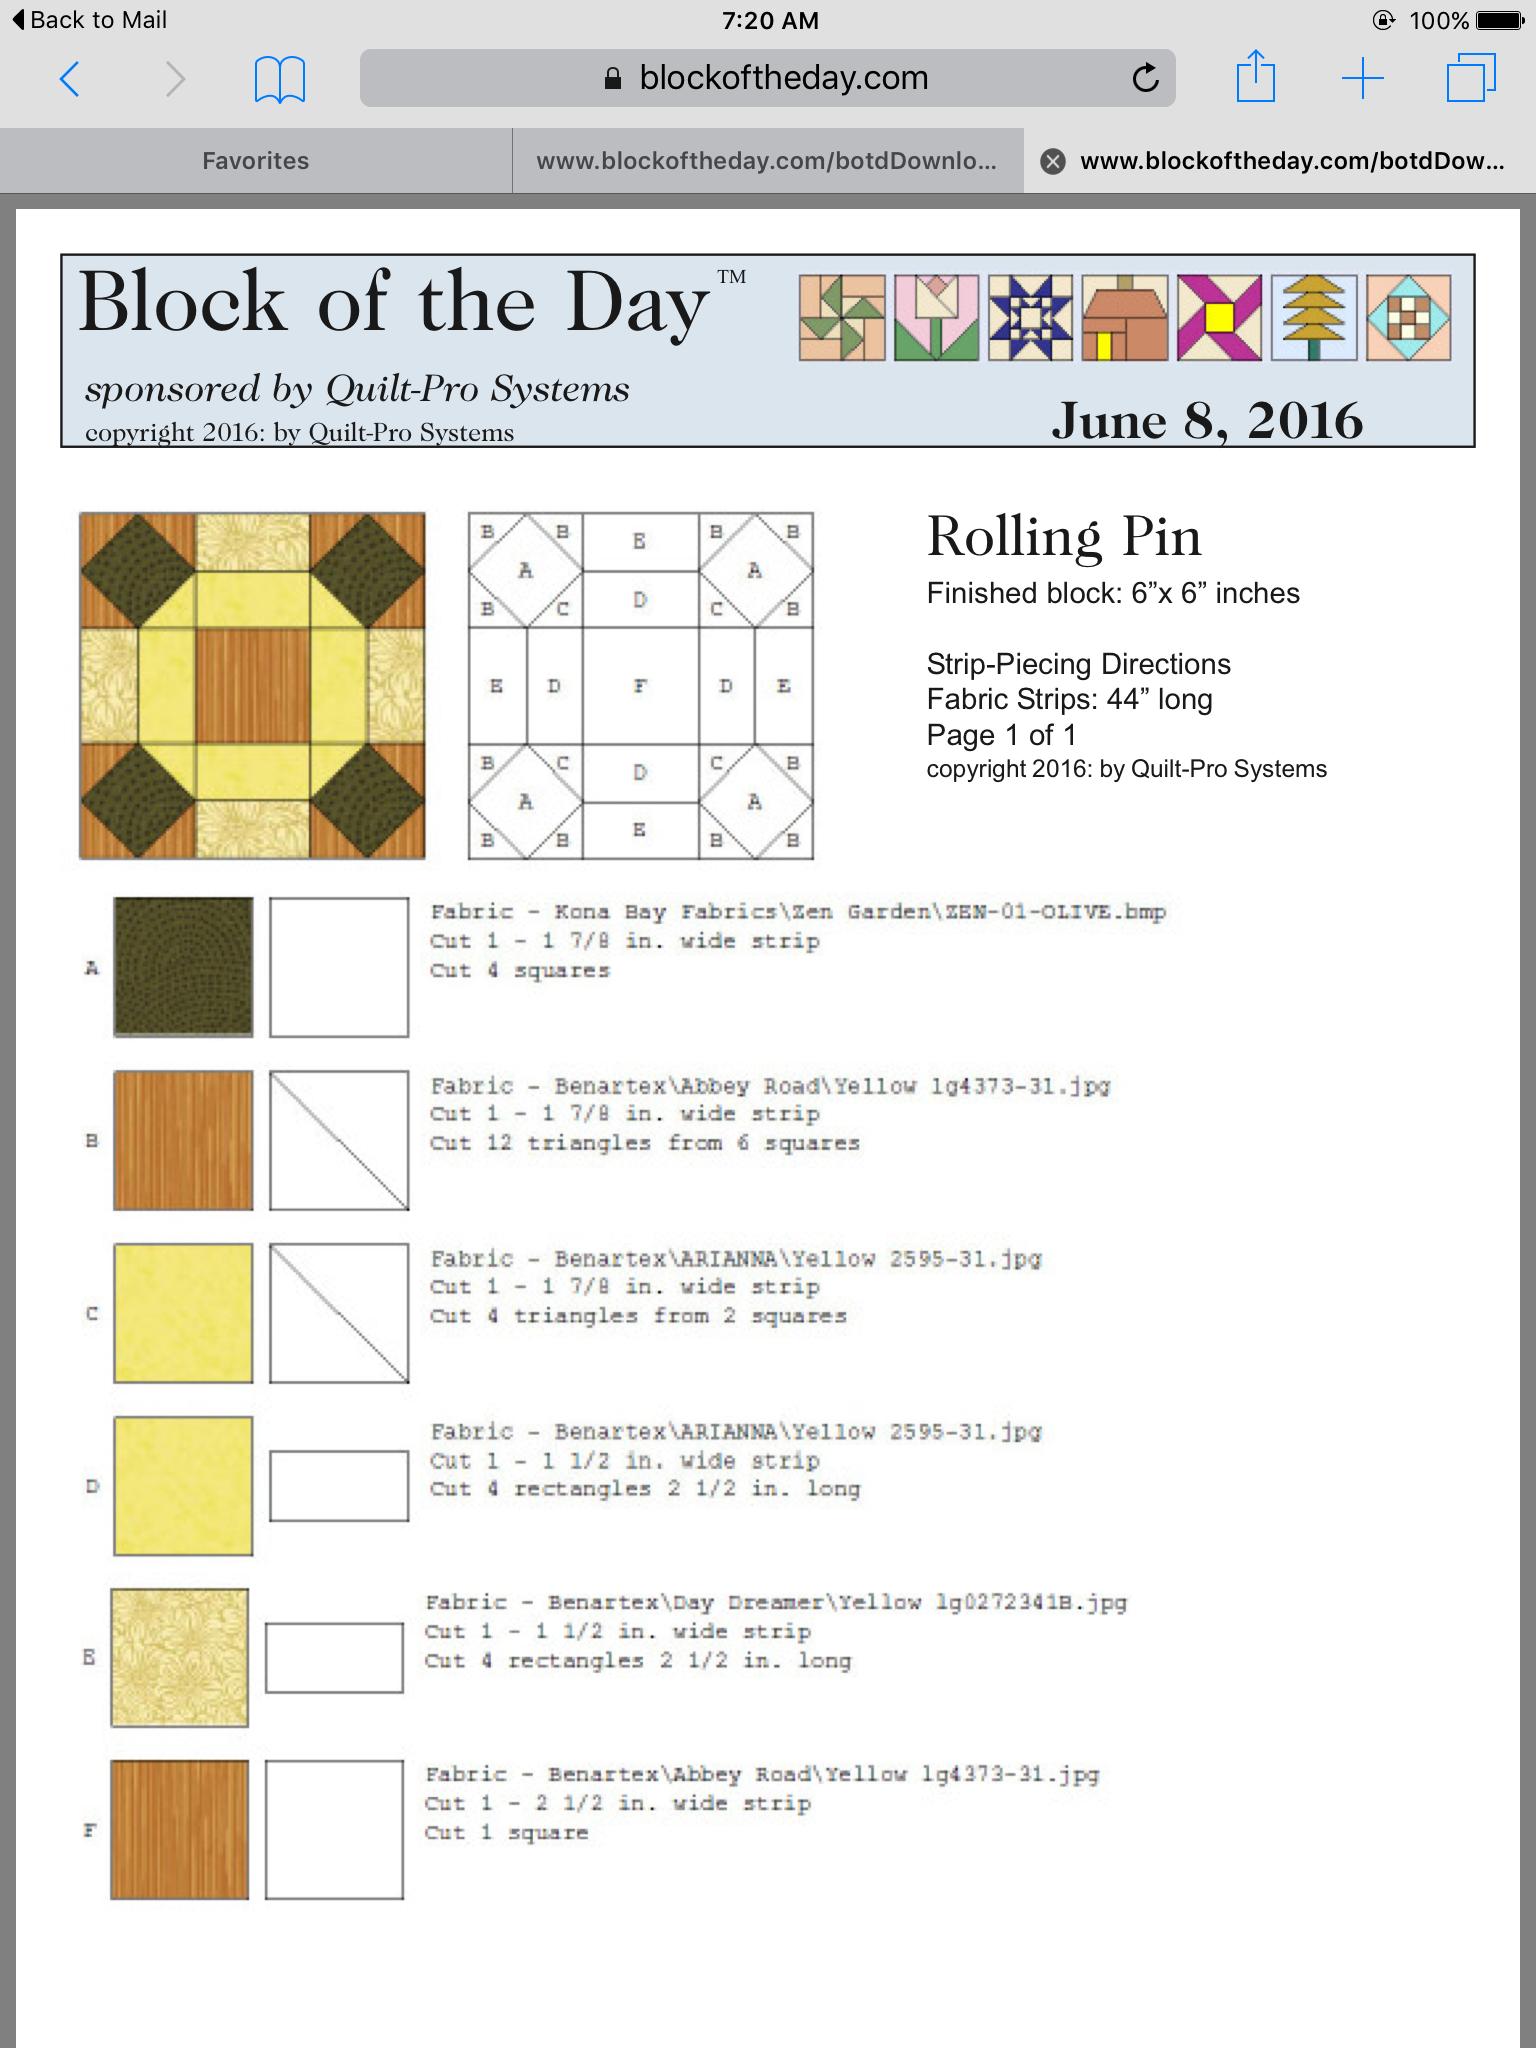 Rolling Pin Block